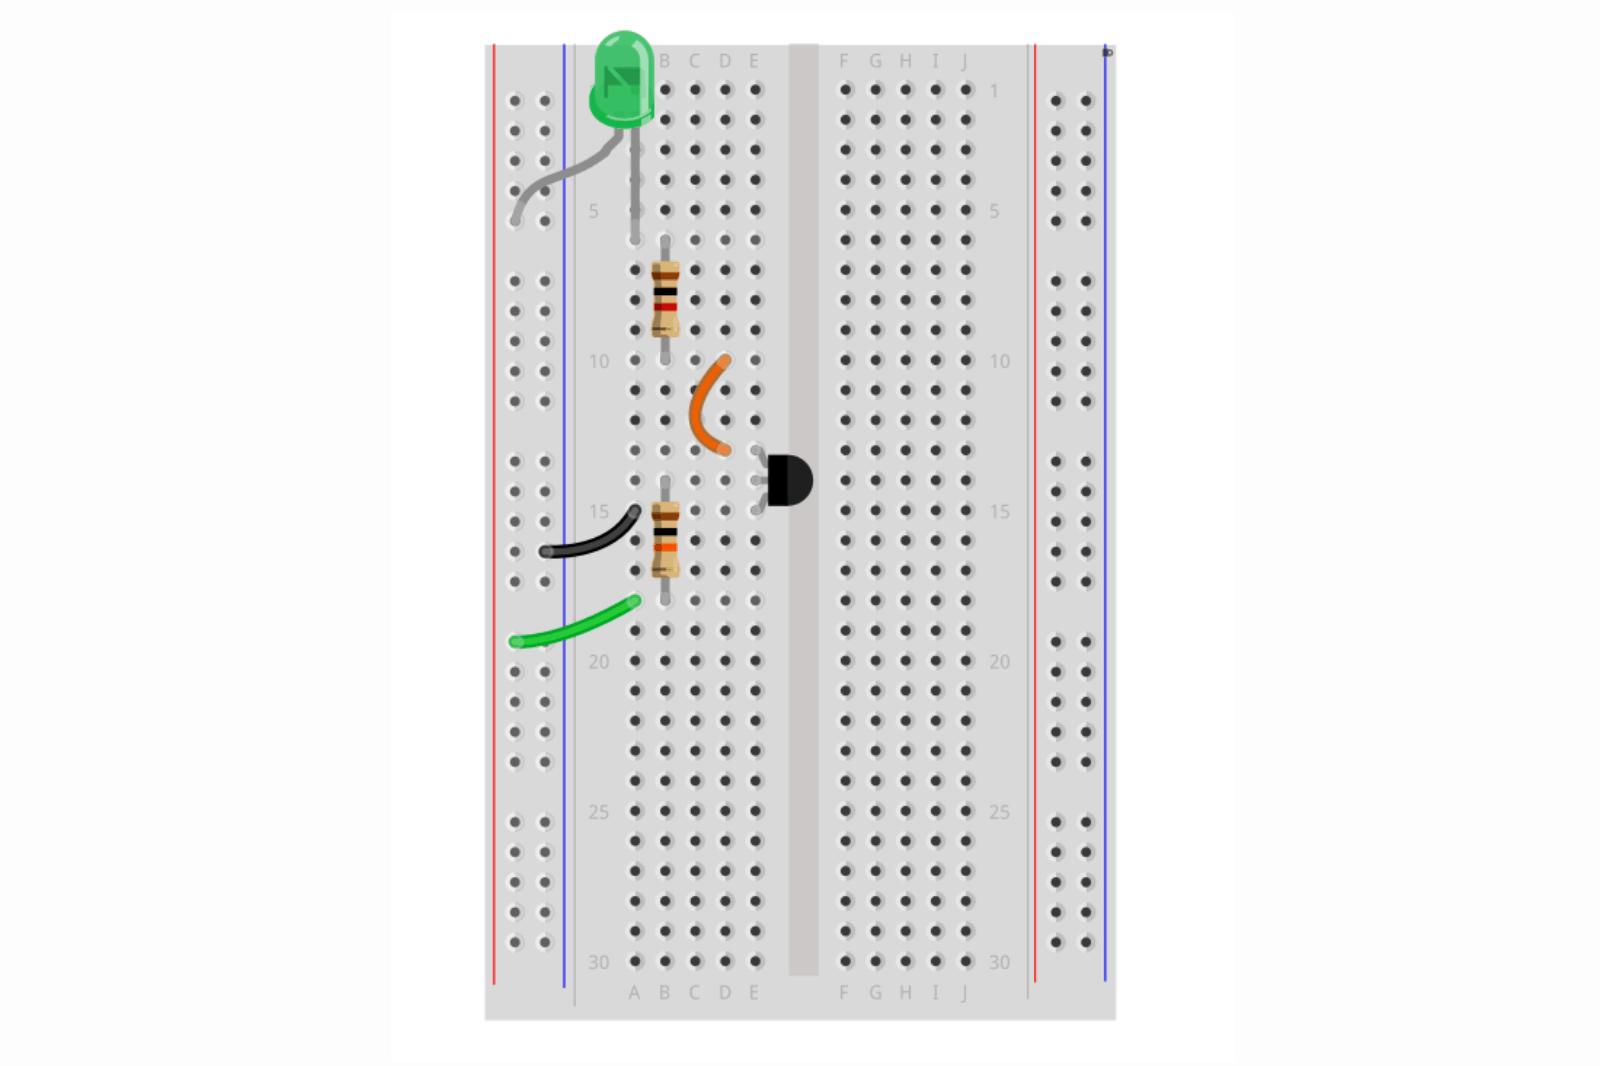 kurs_elektroniki_tranzystory_schemat_mon